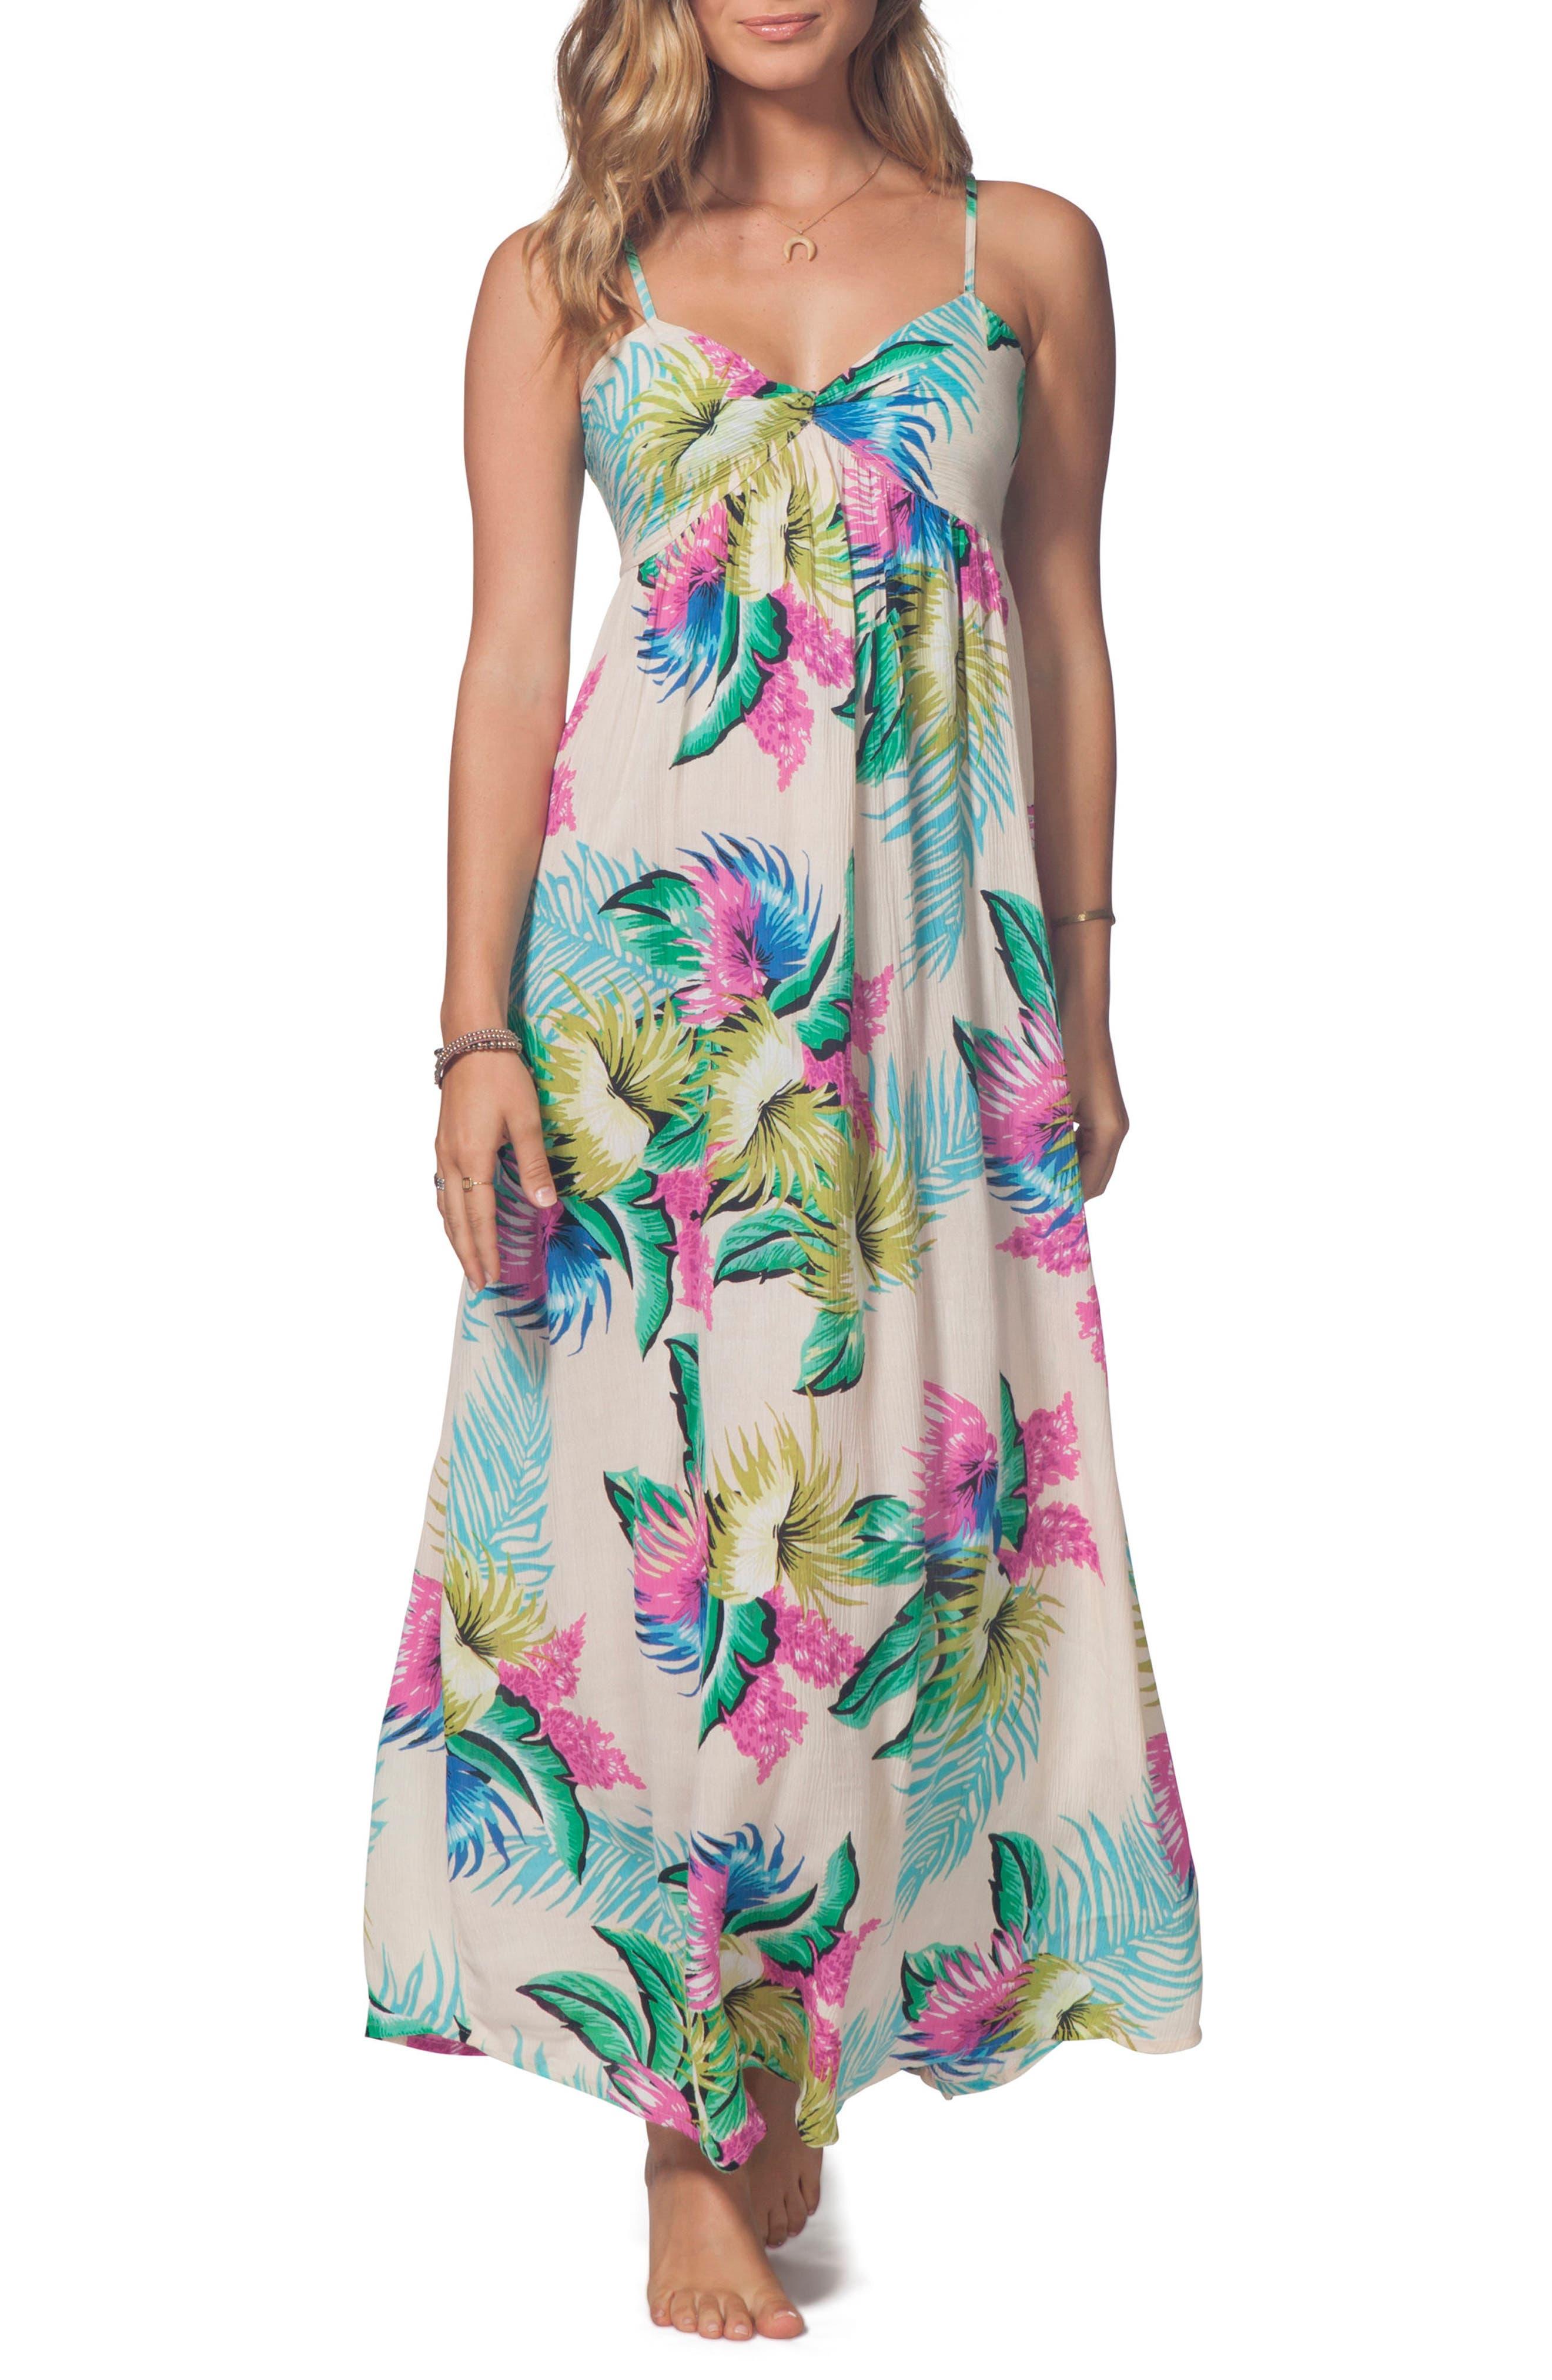 Ophelia Maxi Dress,                             Main thumbnail 1, color,                             901